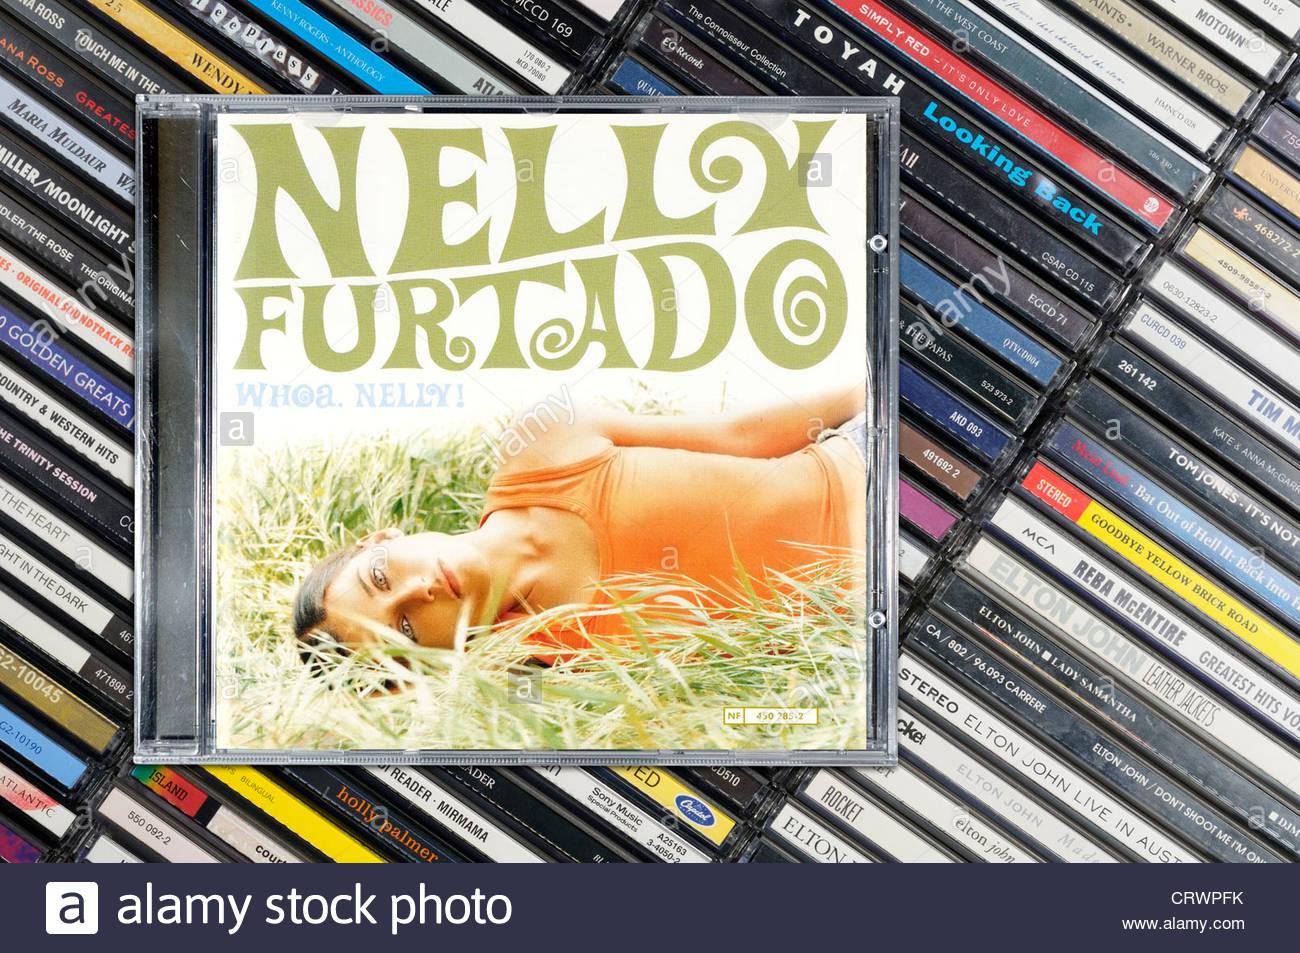 Nelly Furtado album, Whoa Nelly piled music CD cases, England. Stock Photo